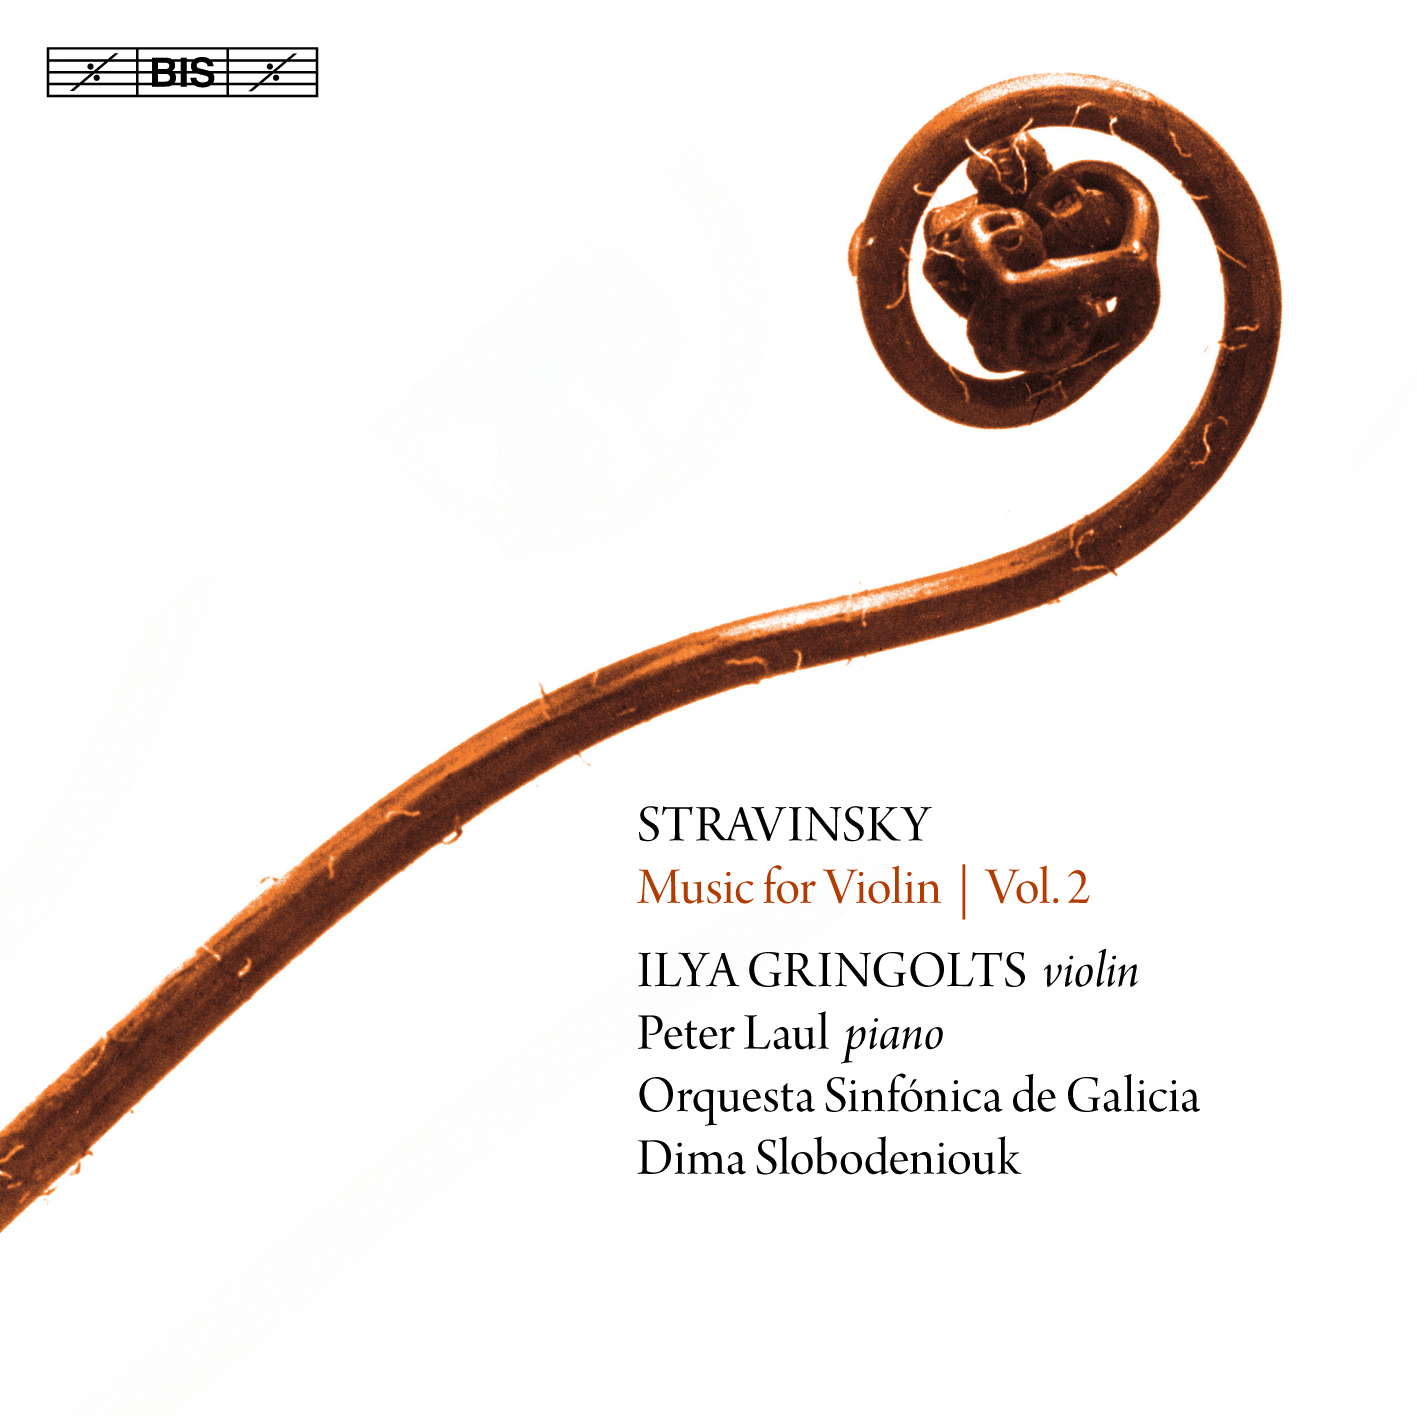 A Orquestra Sinfónica de Galicia entra no catálogo de BIS Records